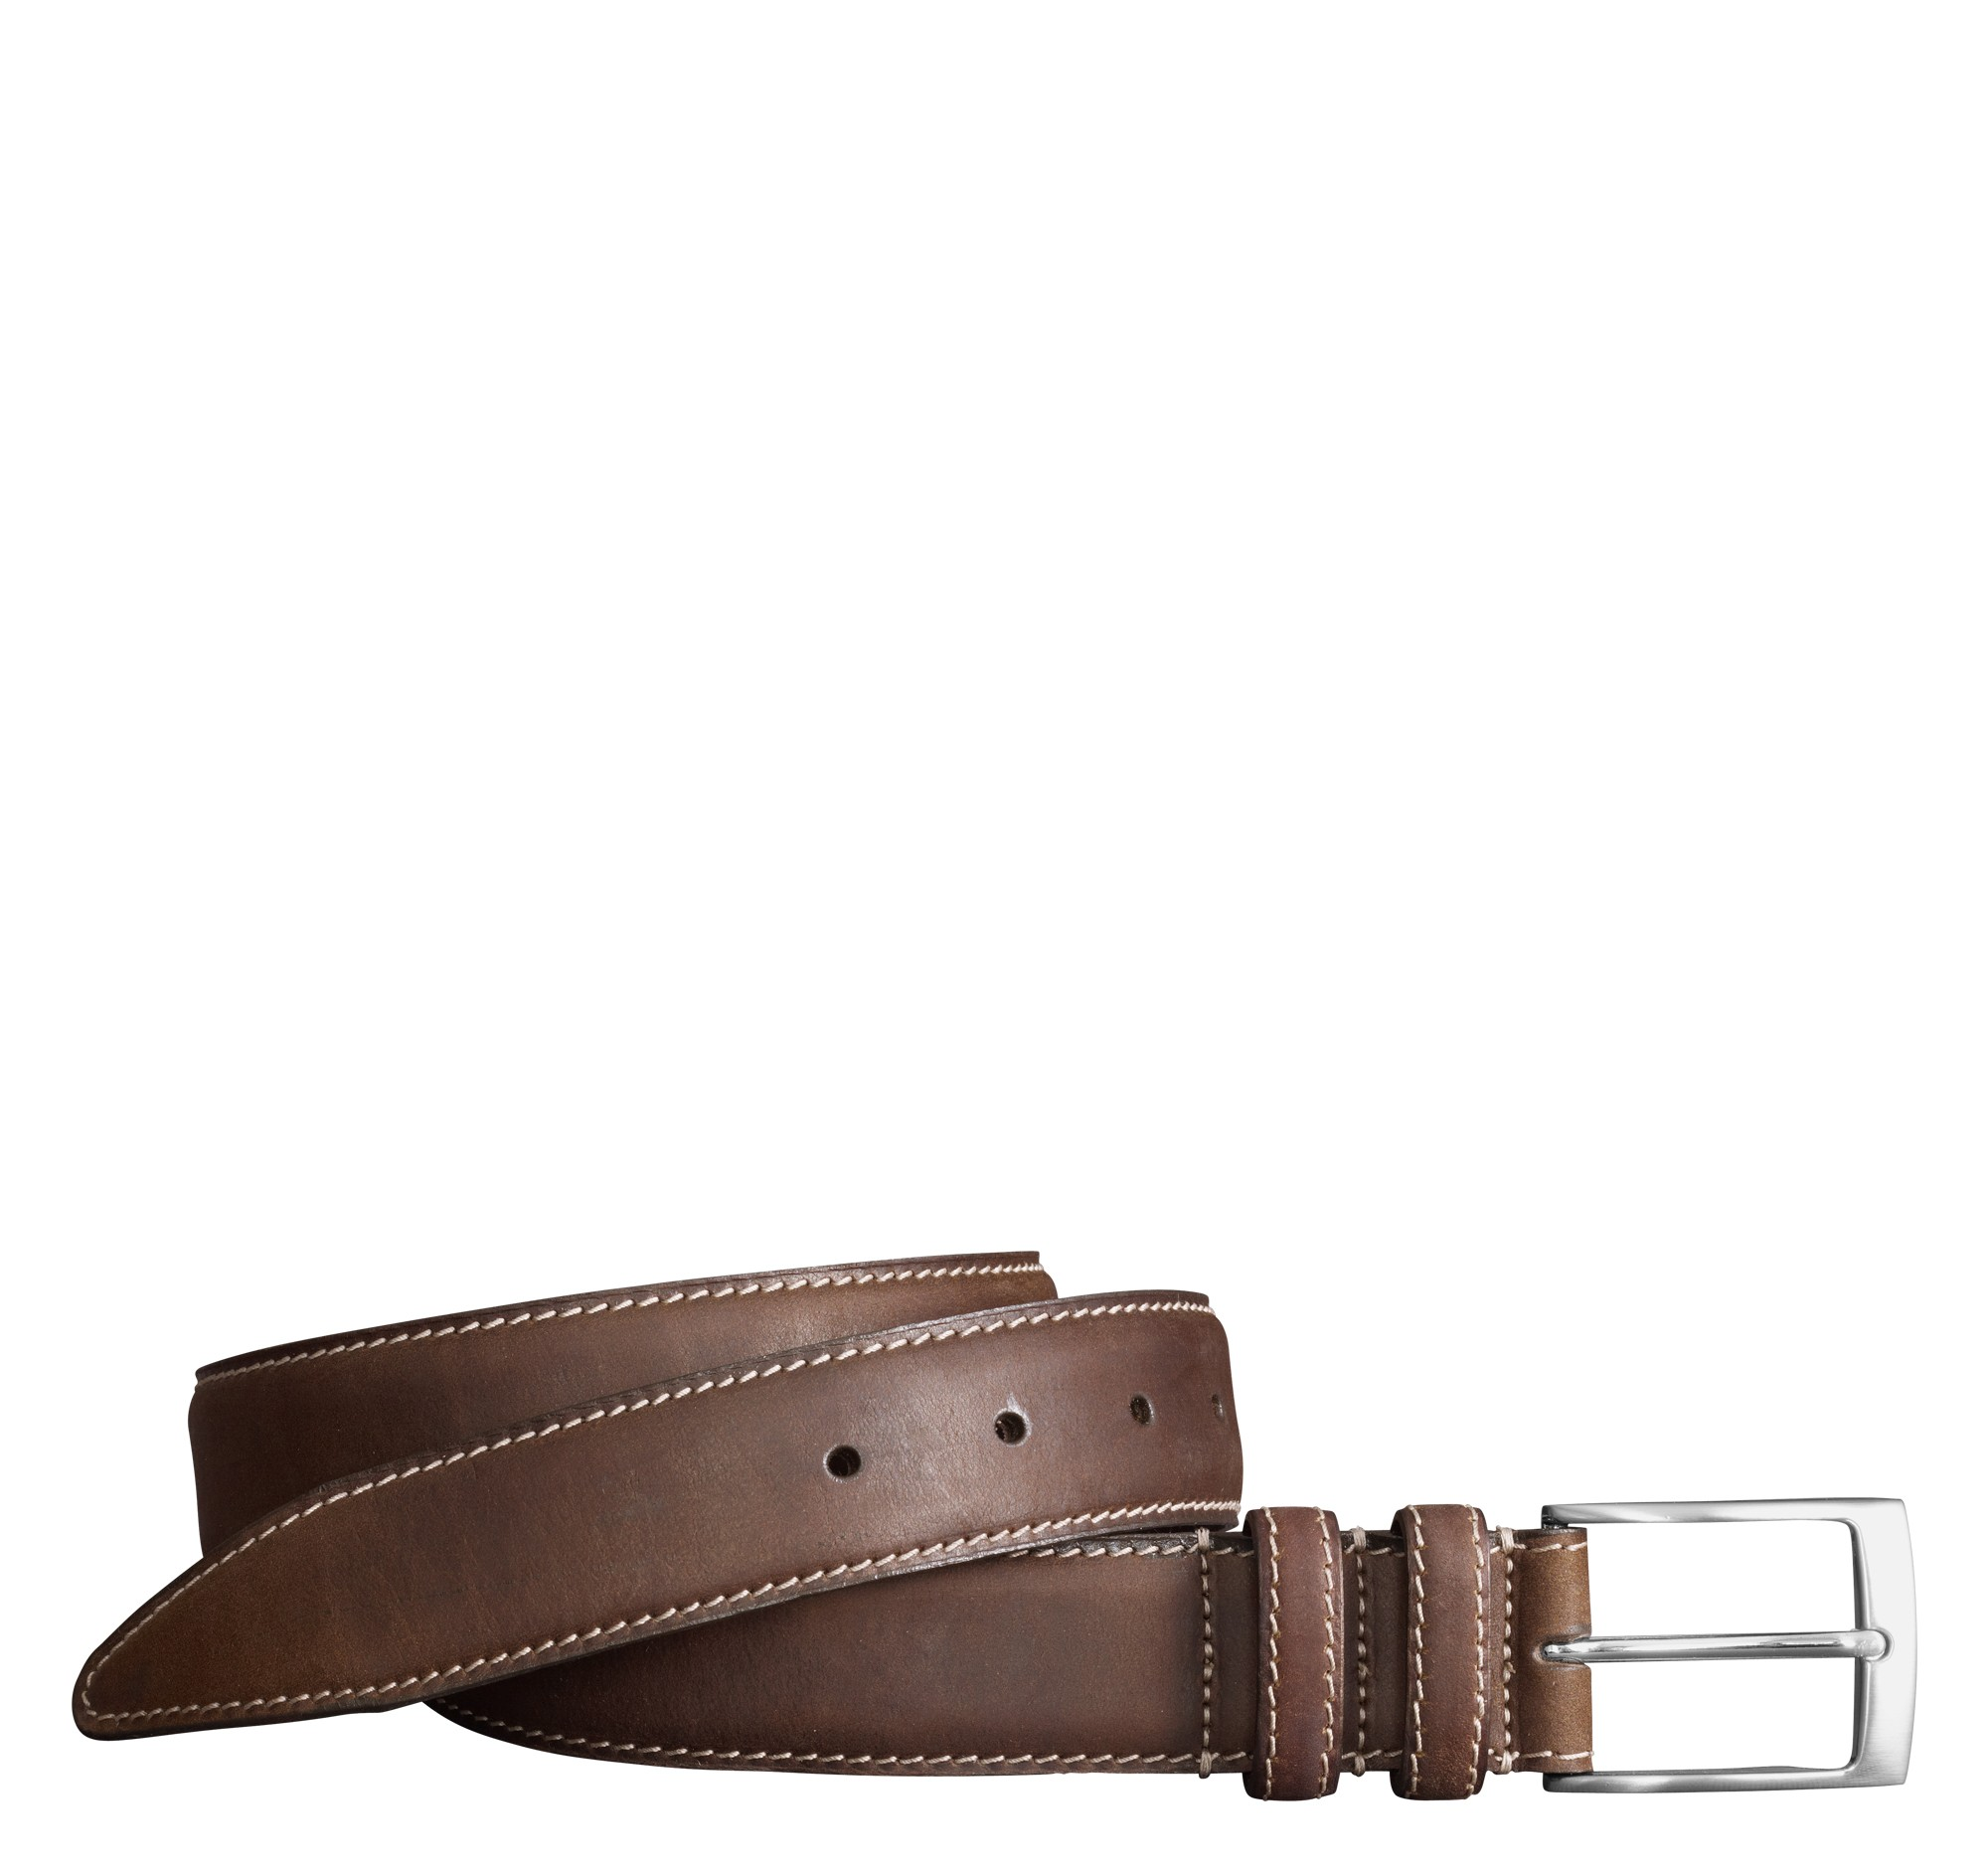 JandM Distressed Casual Belt.jpg